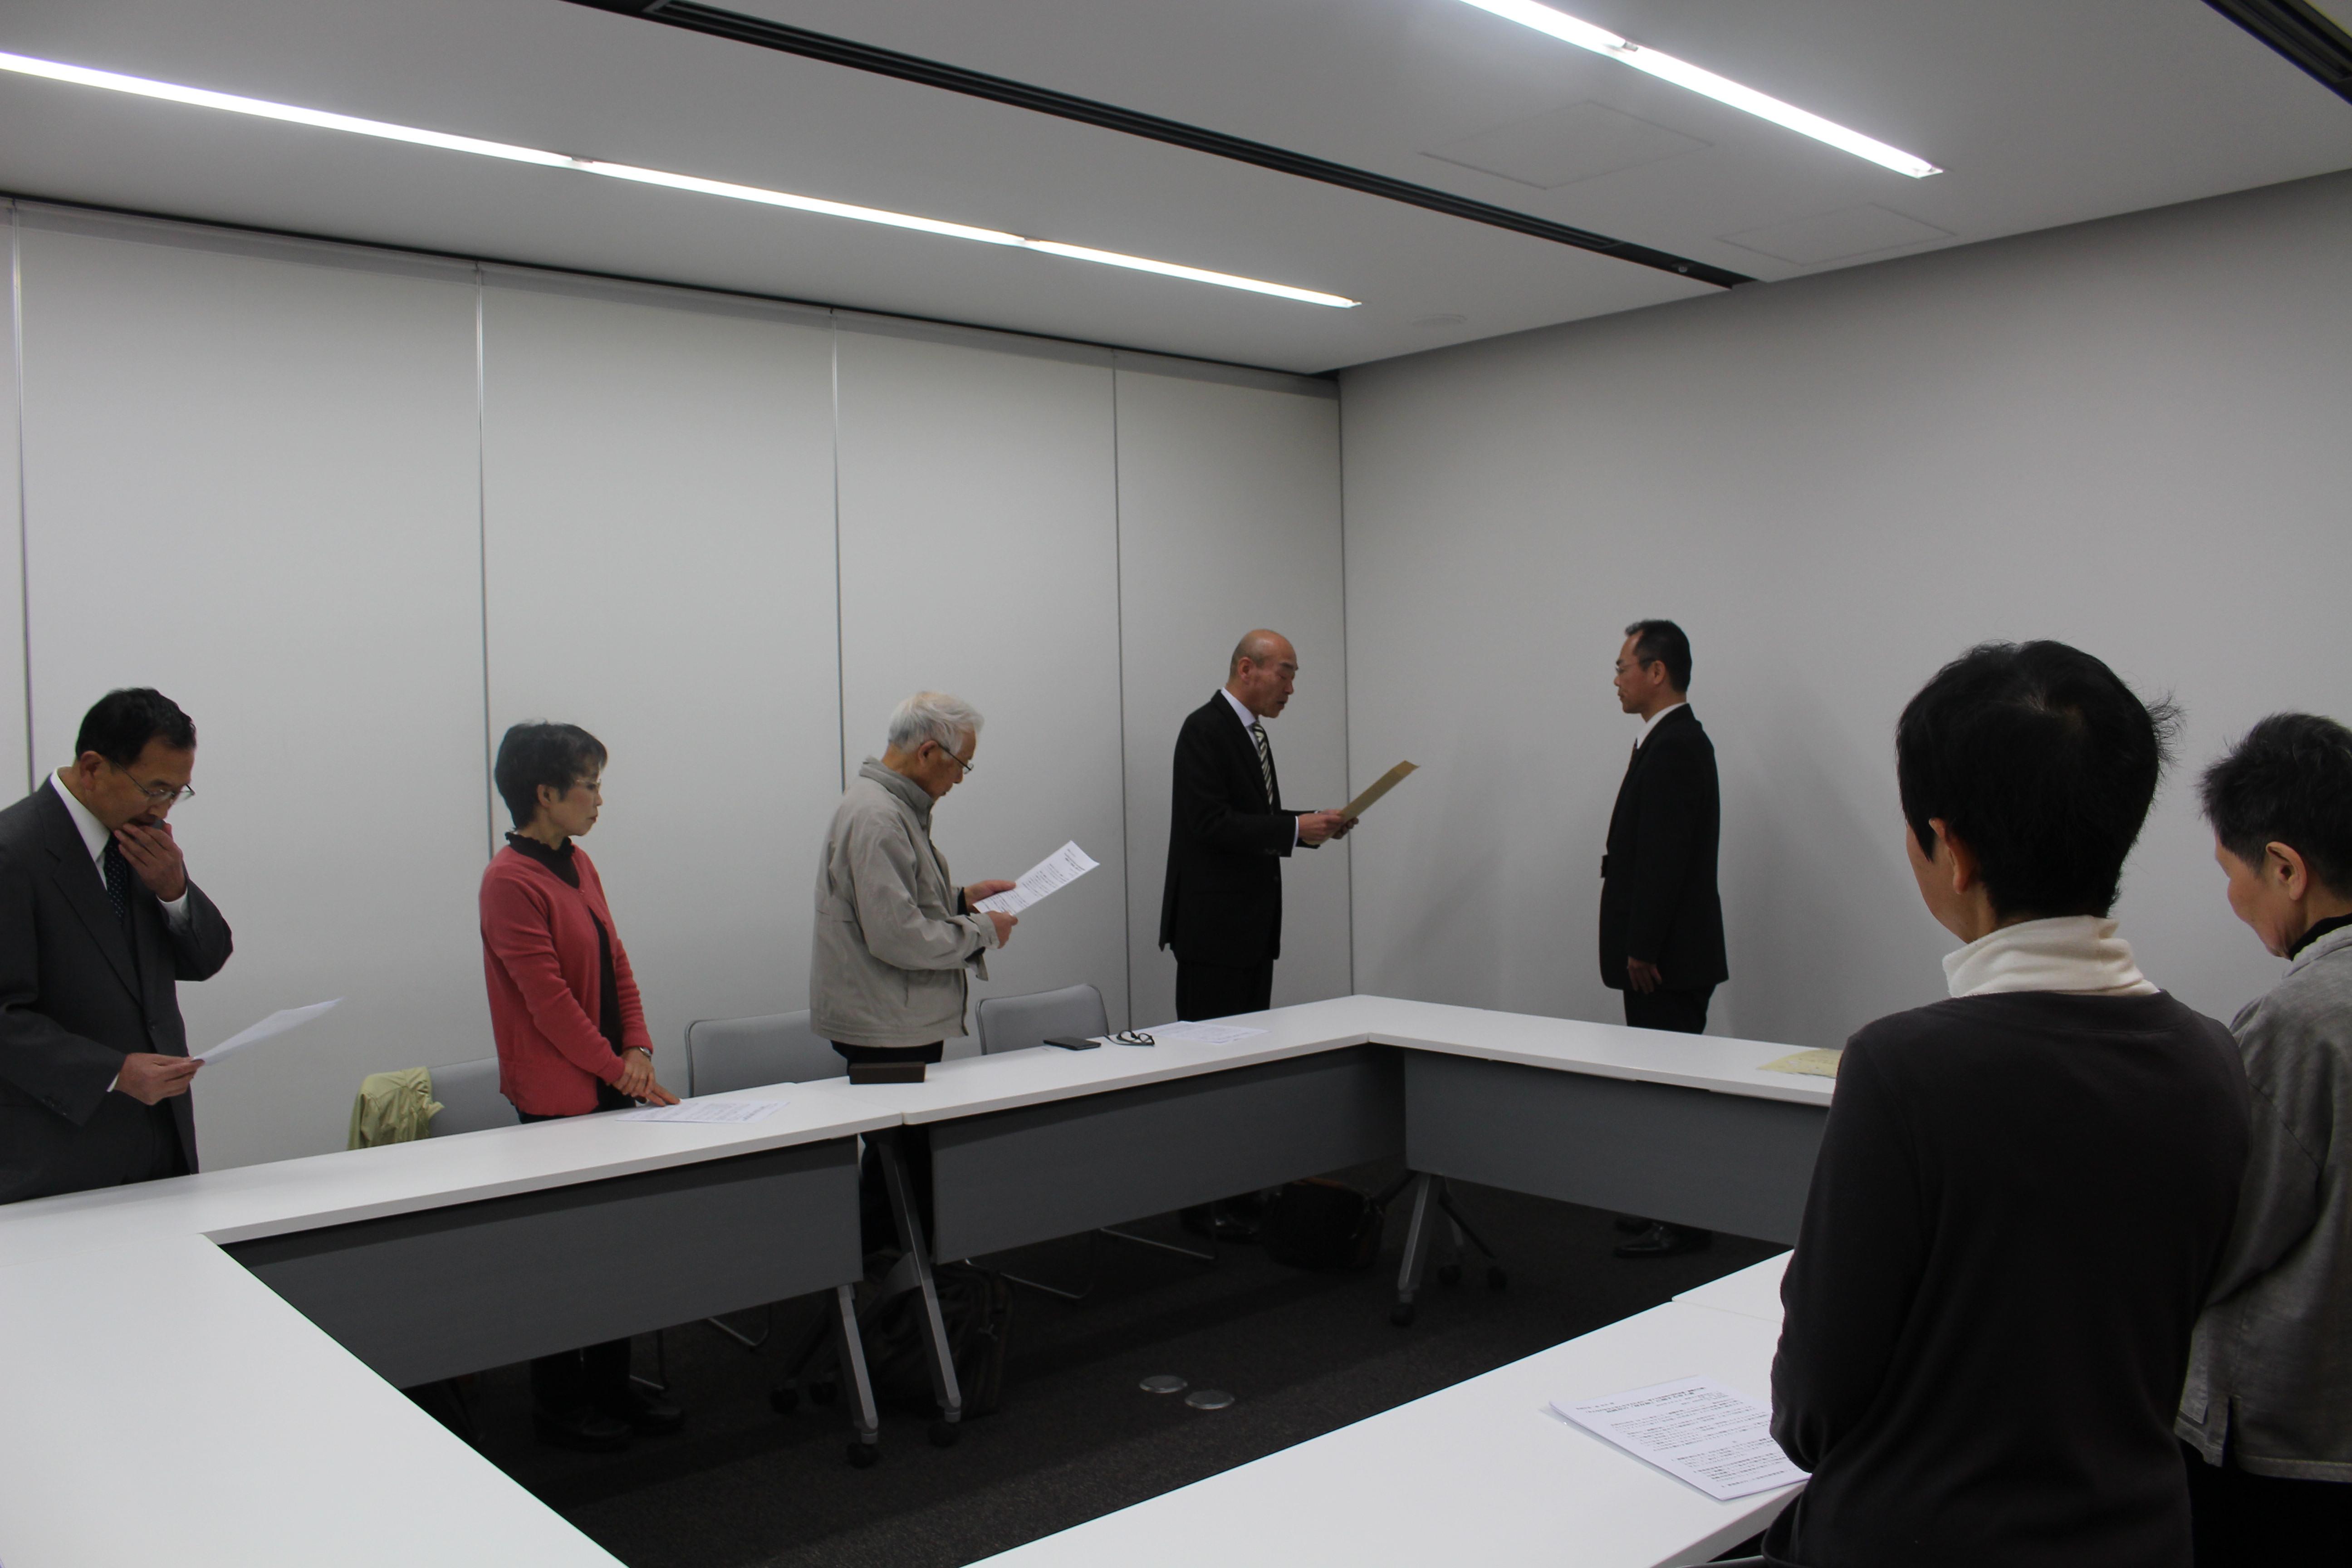 2016-04-11_photo.jpg